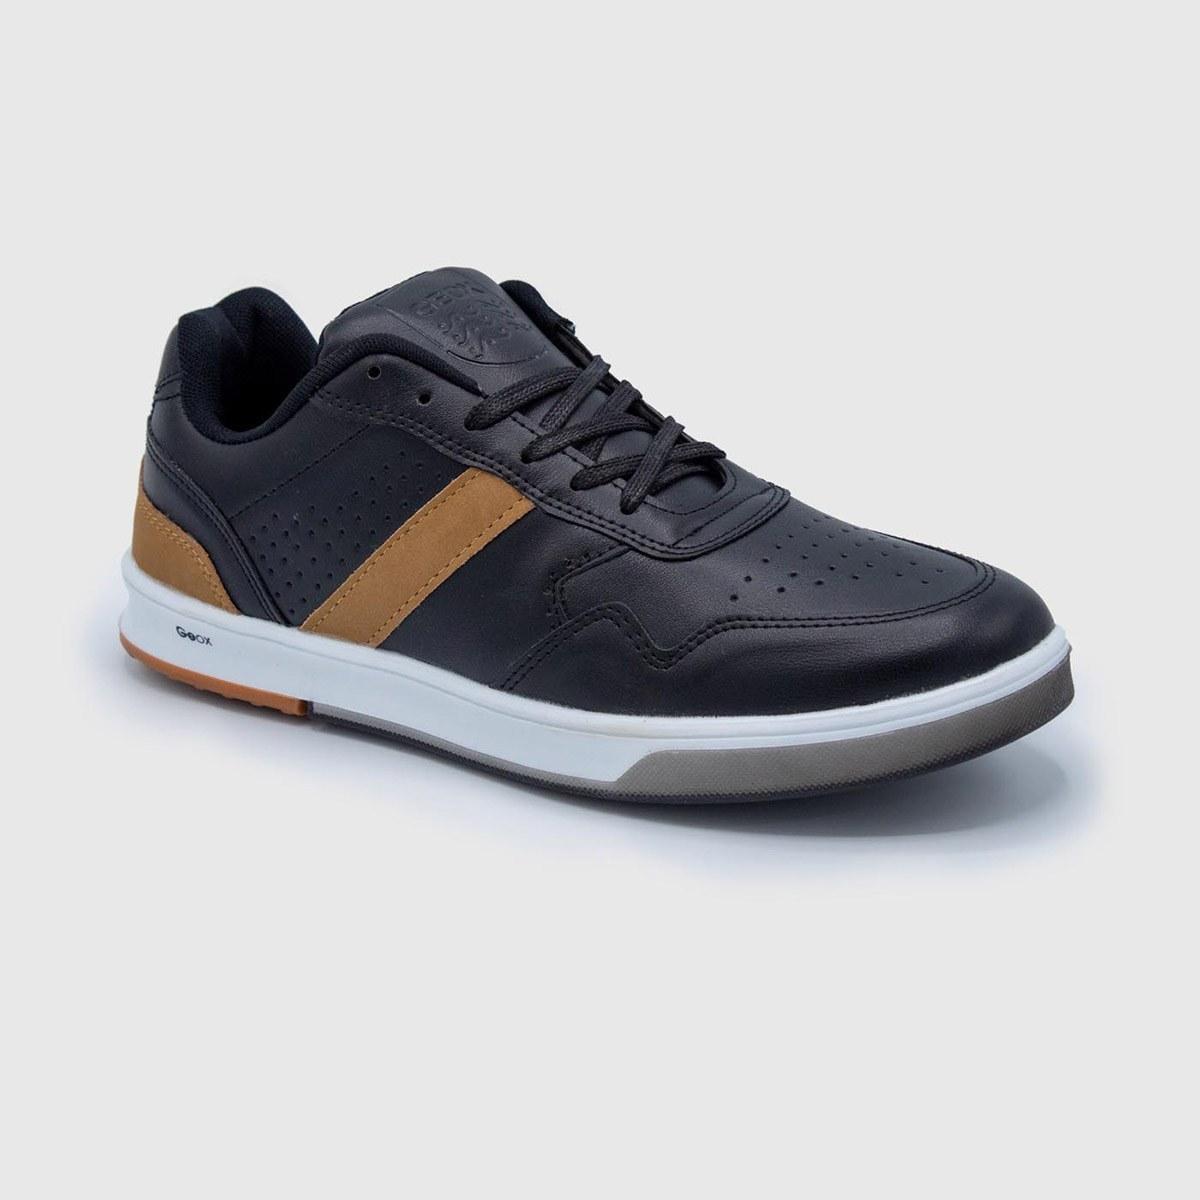 تصویر کفش اسپرت مردانه مدل Geox کد 9914